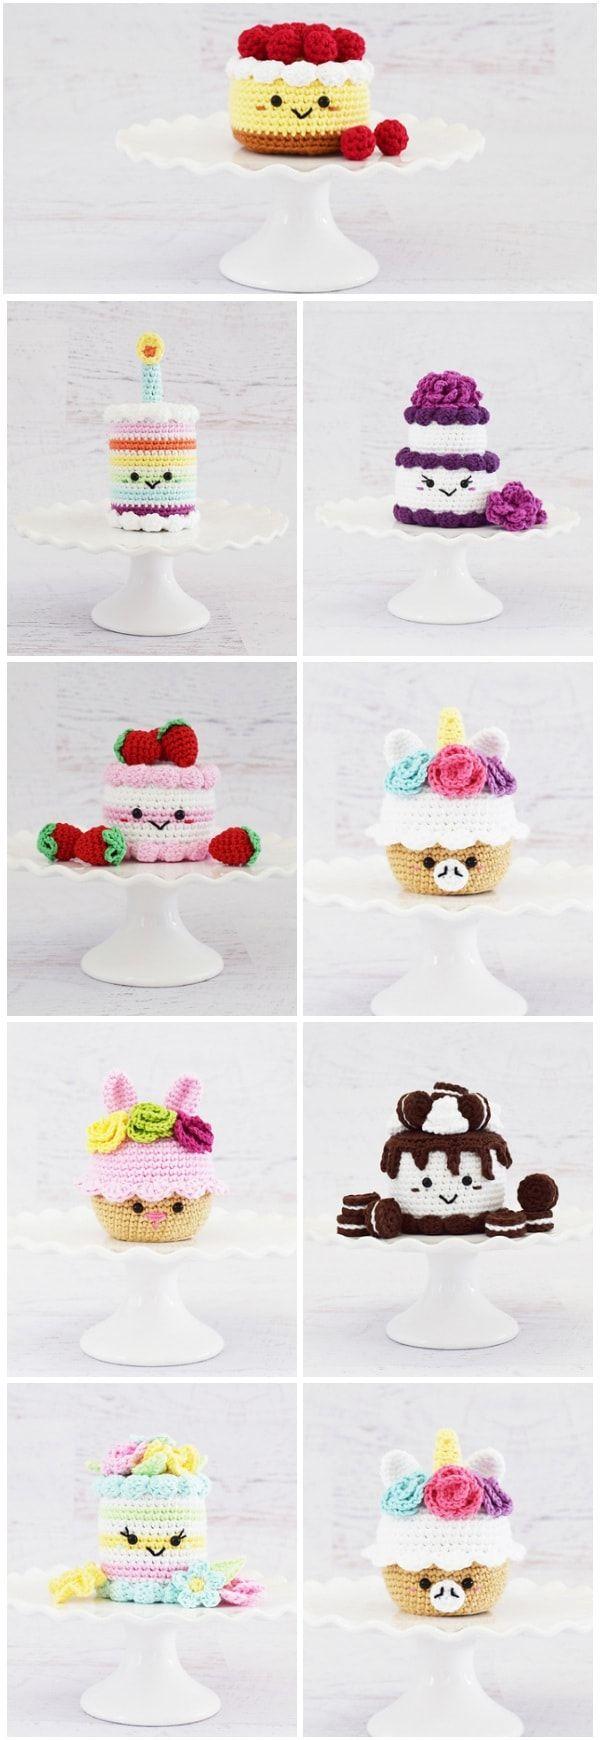 9 Free Crochet Cupcake and Cake Patterns - Crochet Kingdom